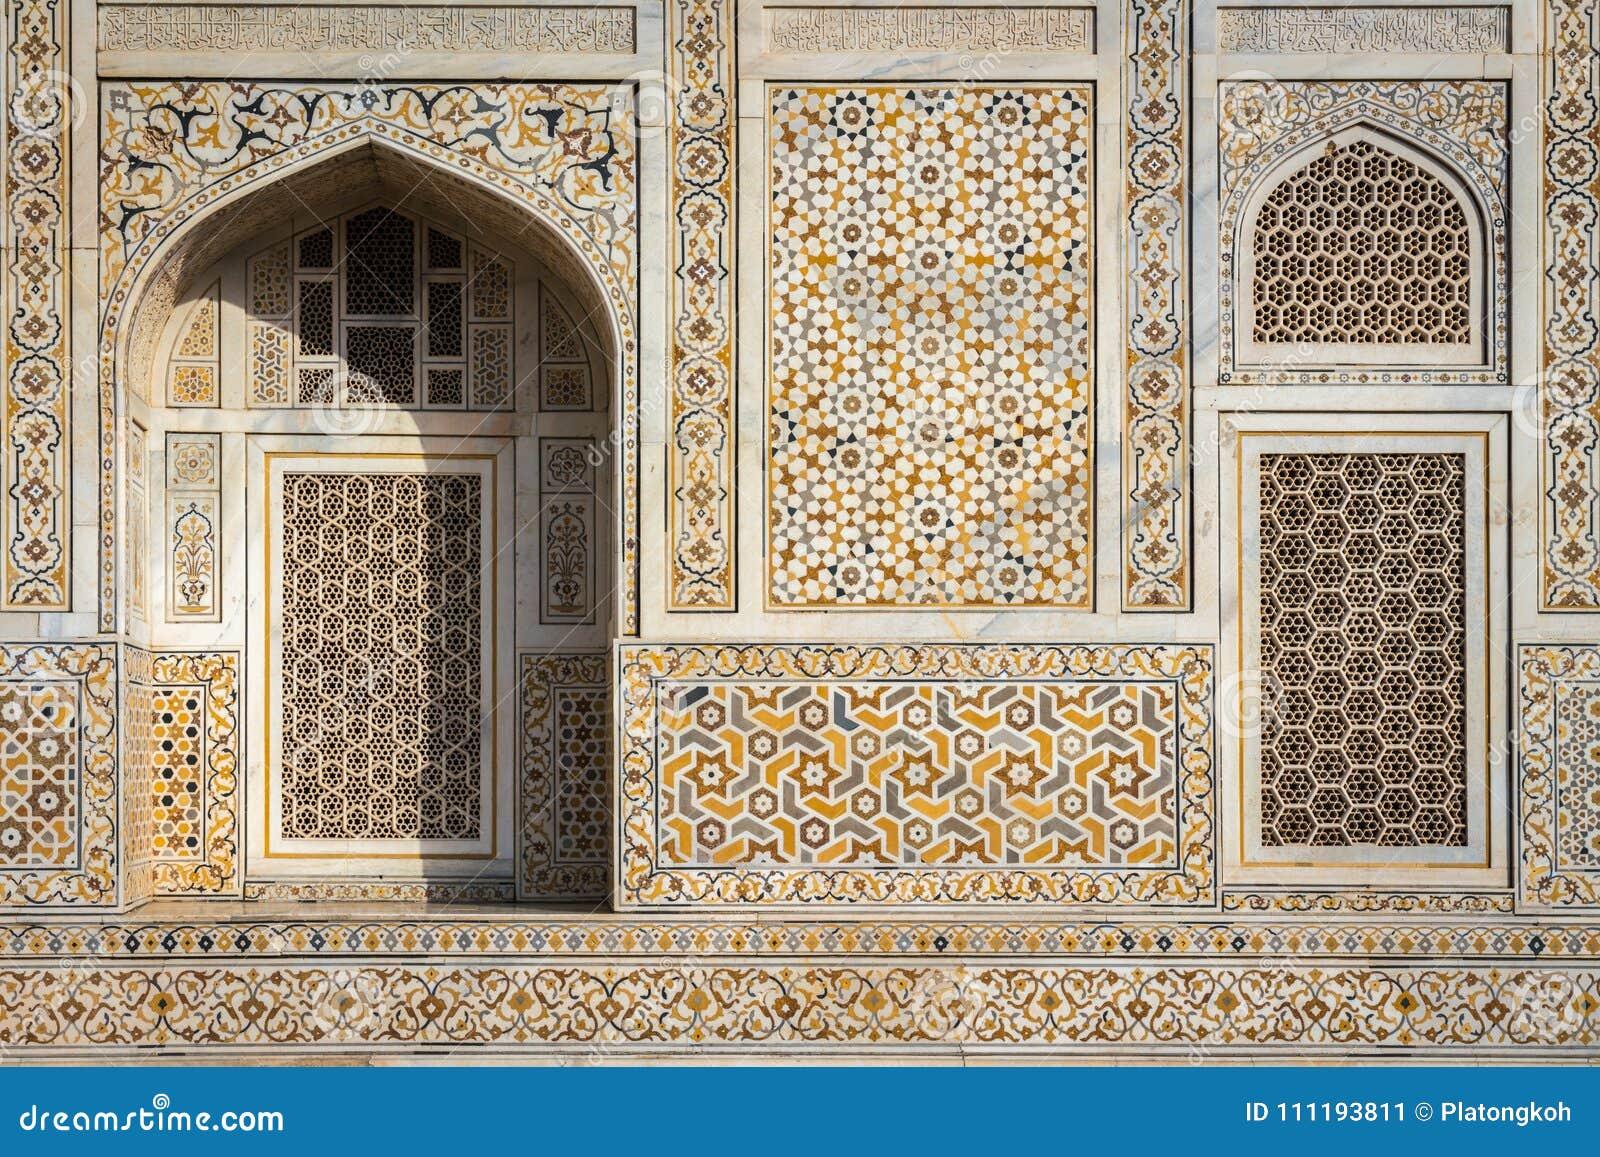 Facade of `Baby Taj` mausoleum in Agra, India.